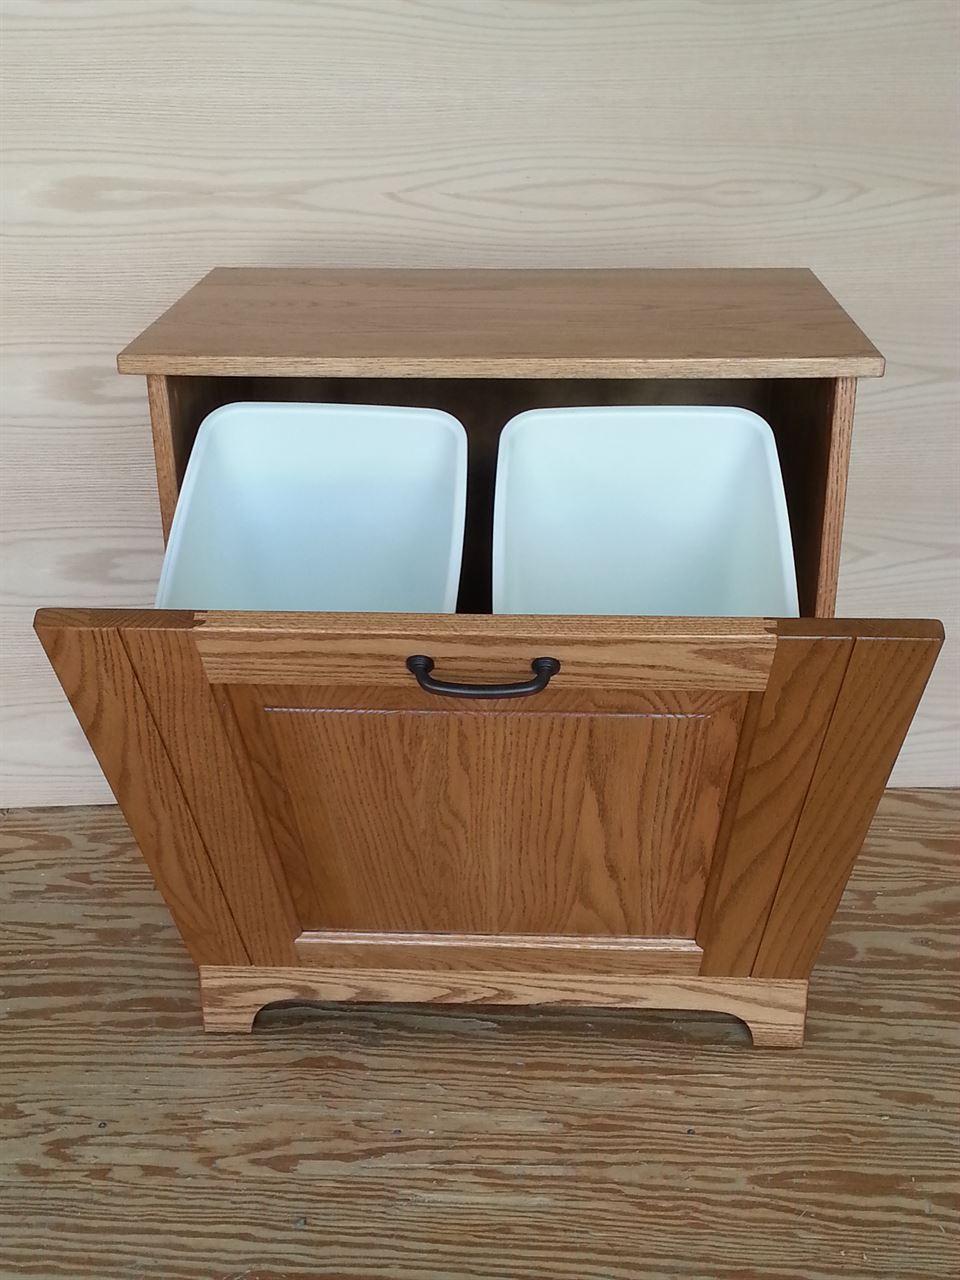 Four Seasons Furnishings Amish Made Furniture Amish Made